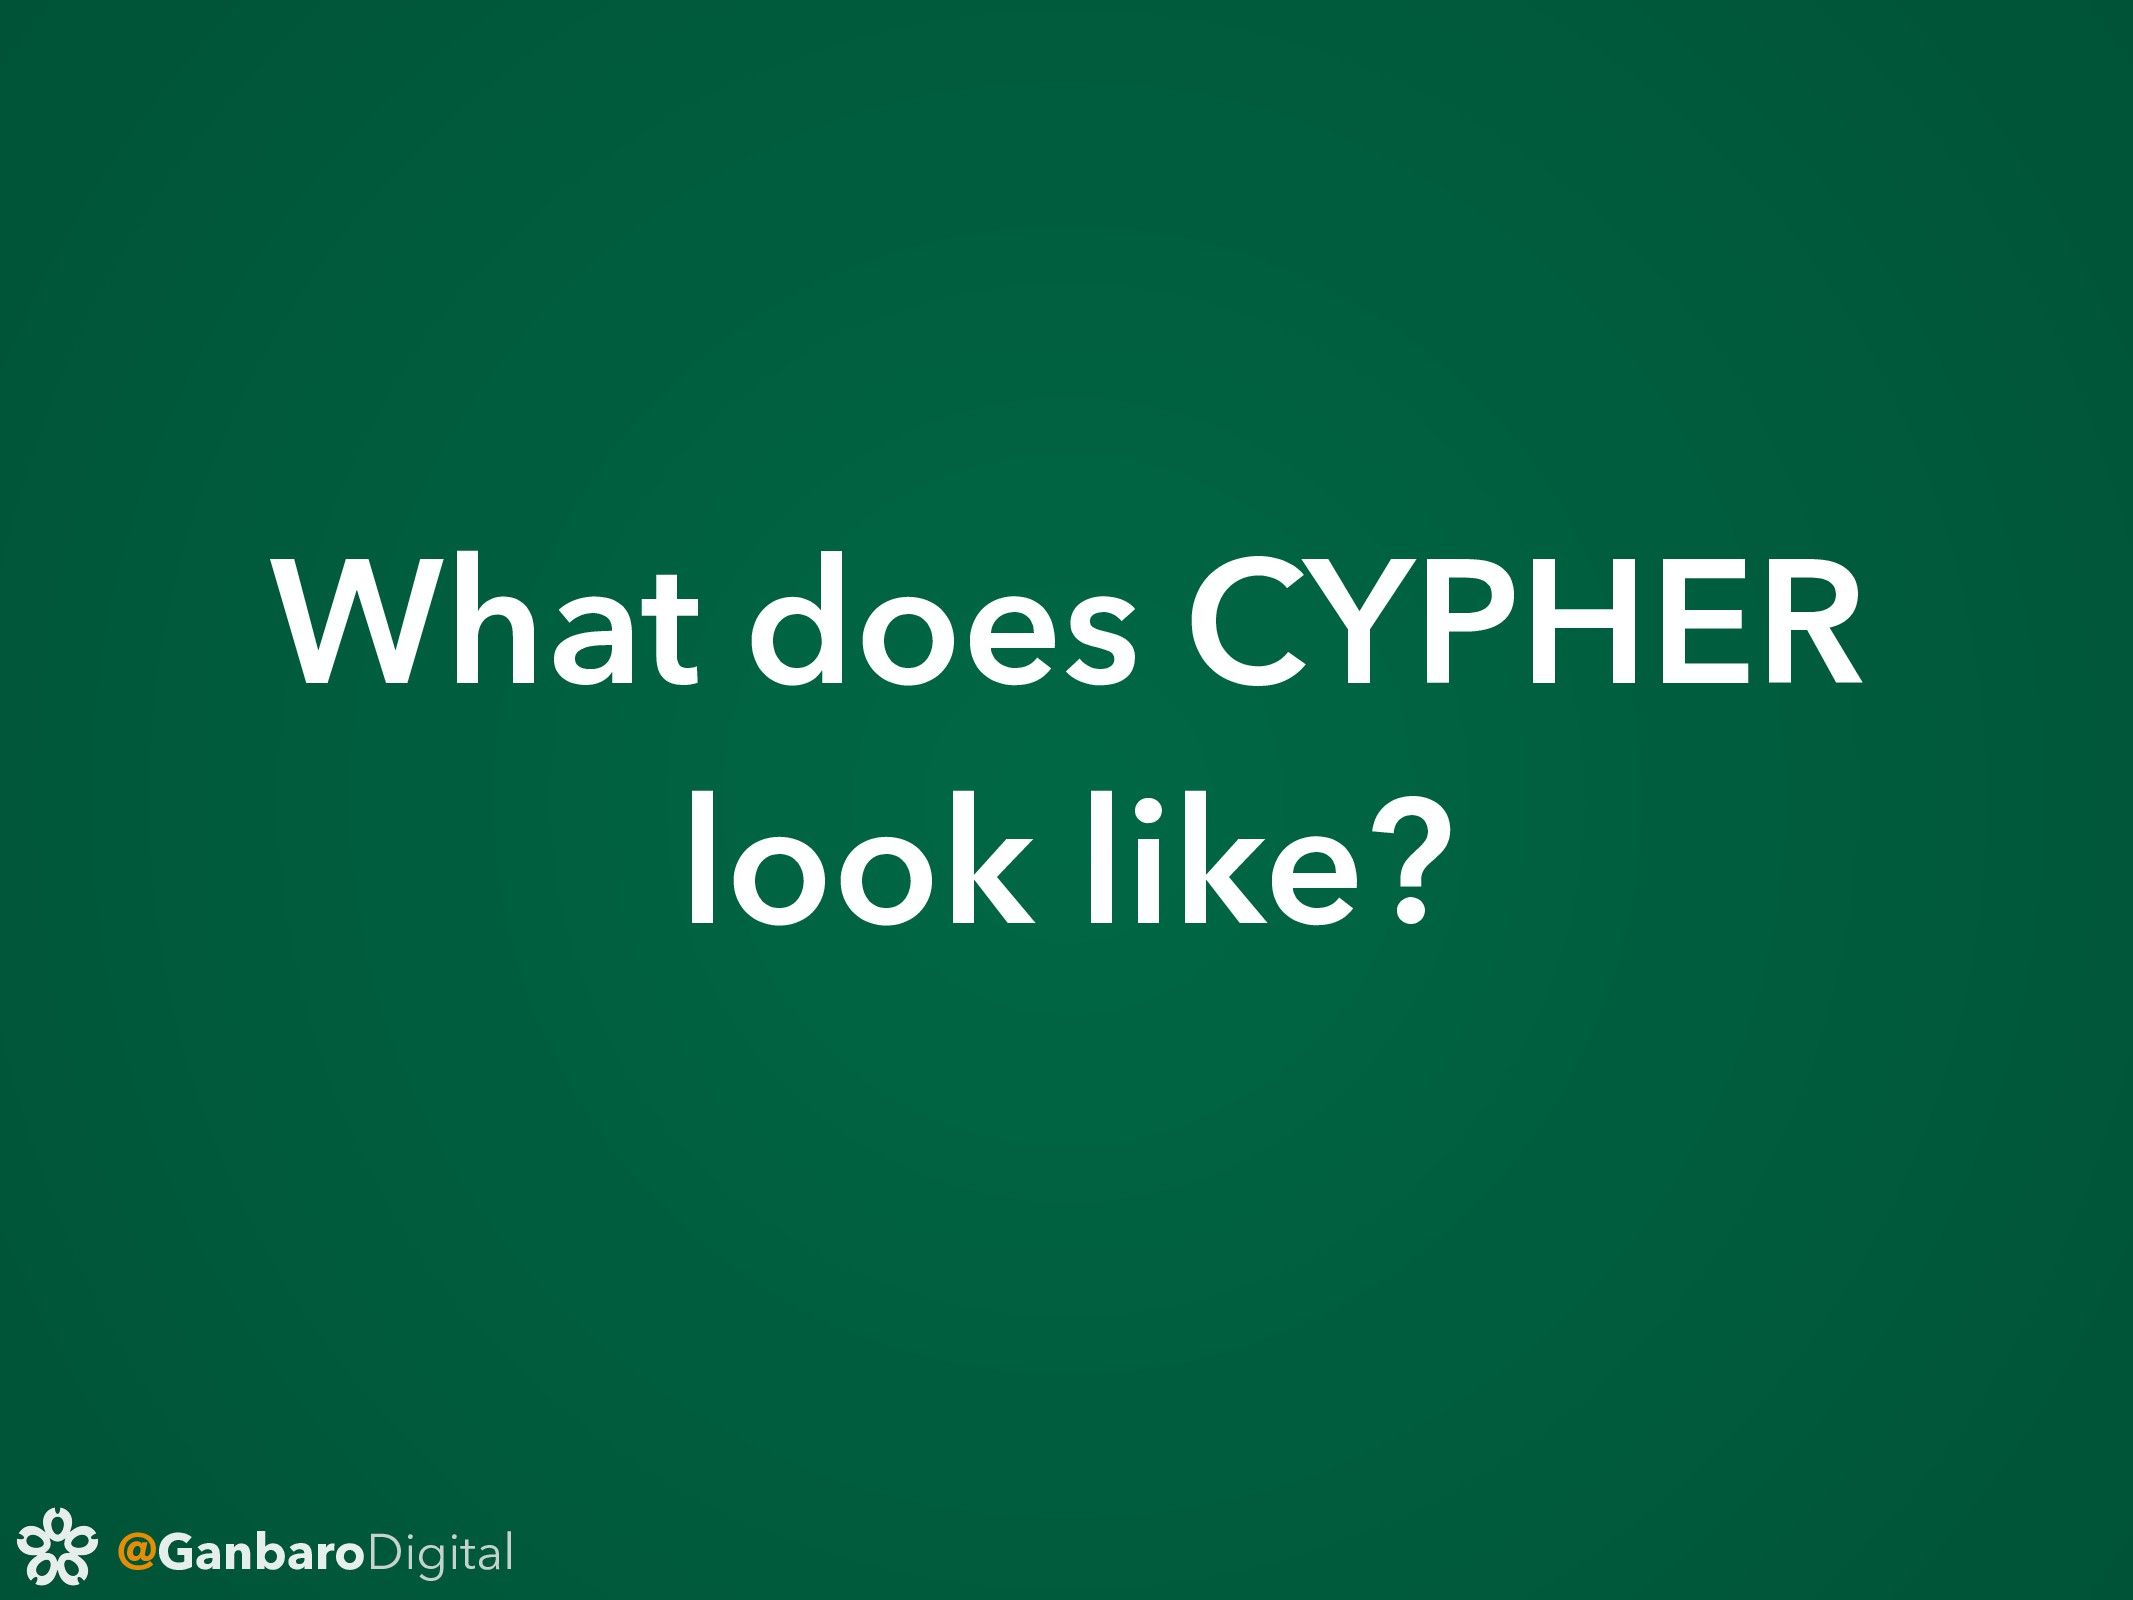 @GanbaroDigital What does CYPHER look like?